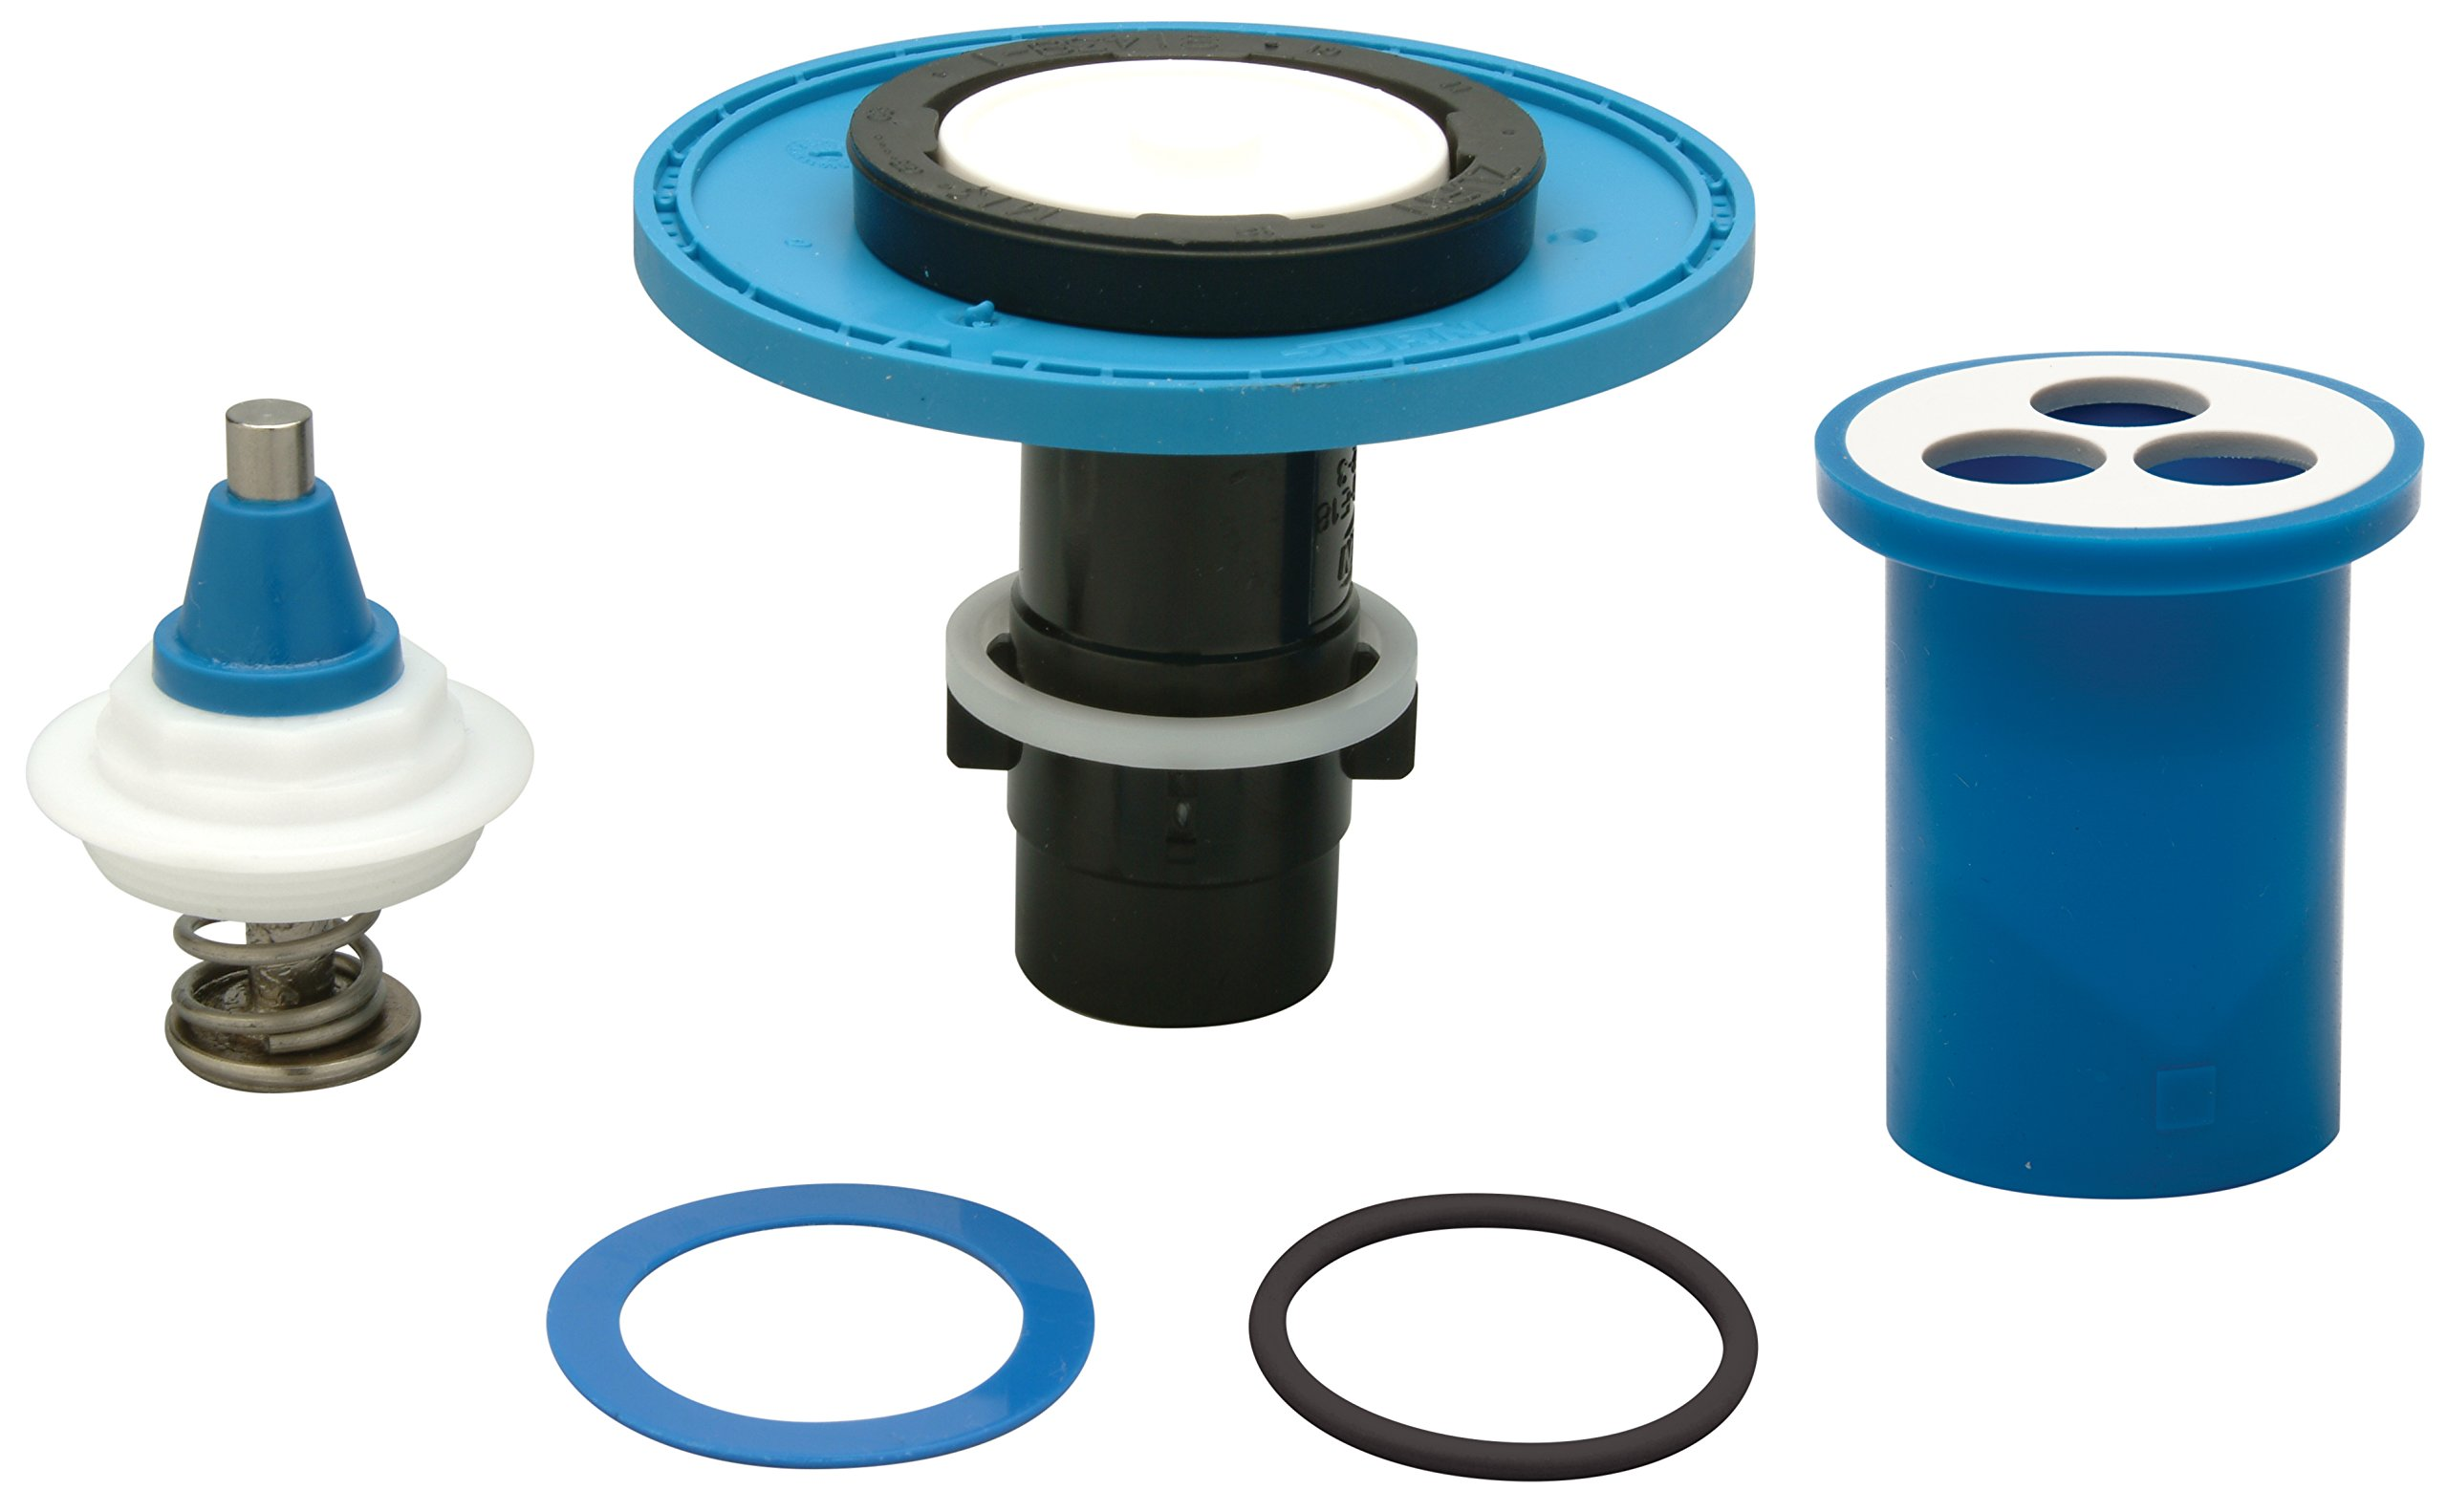 Zurn AquaVantage Closet Rebuild Kit , P6000-ECA-HET-RK , 1.28 gpf, Diaphragm Rebuild Kit by Zurn